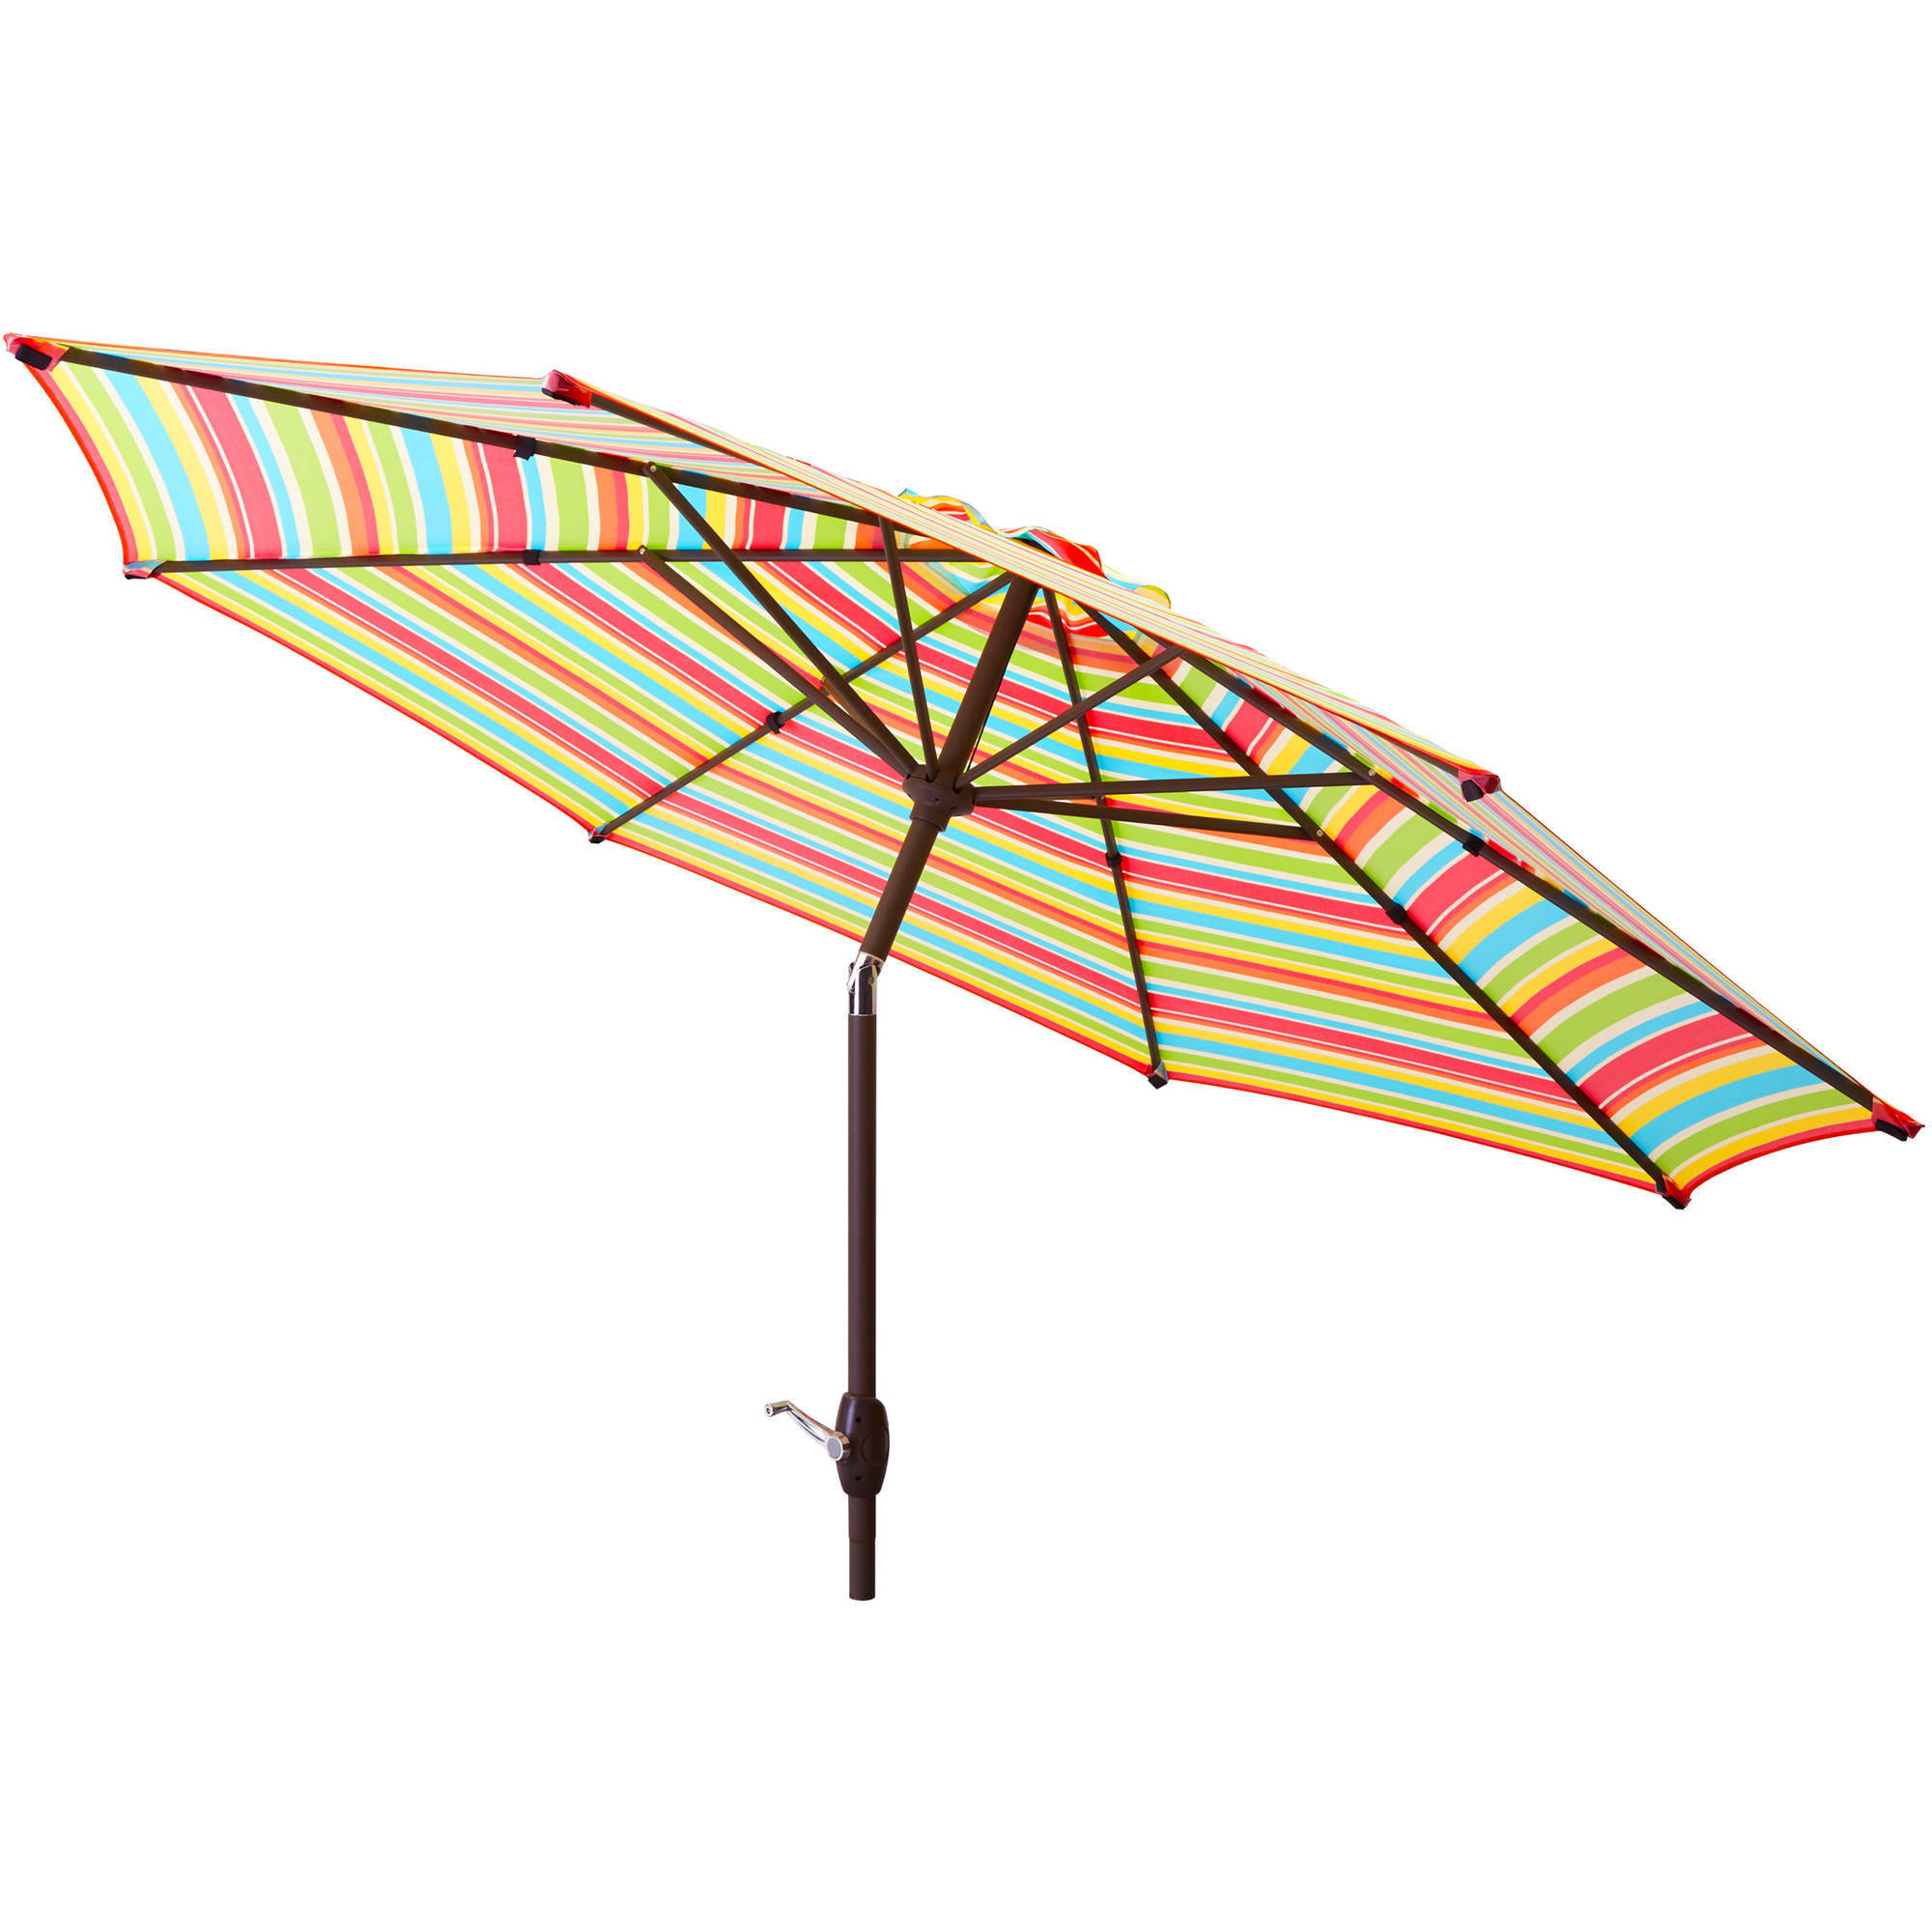 Best ideas about Patio Umbrellas Walmart . Save or Pin Patio Umbrella 9 Aluminum Patio Market Umbrella Tilt W Now.